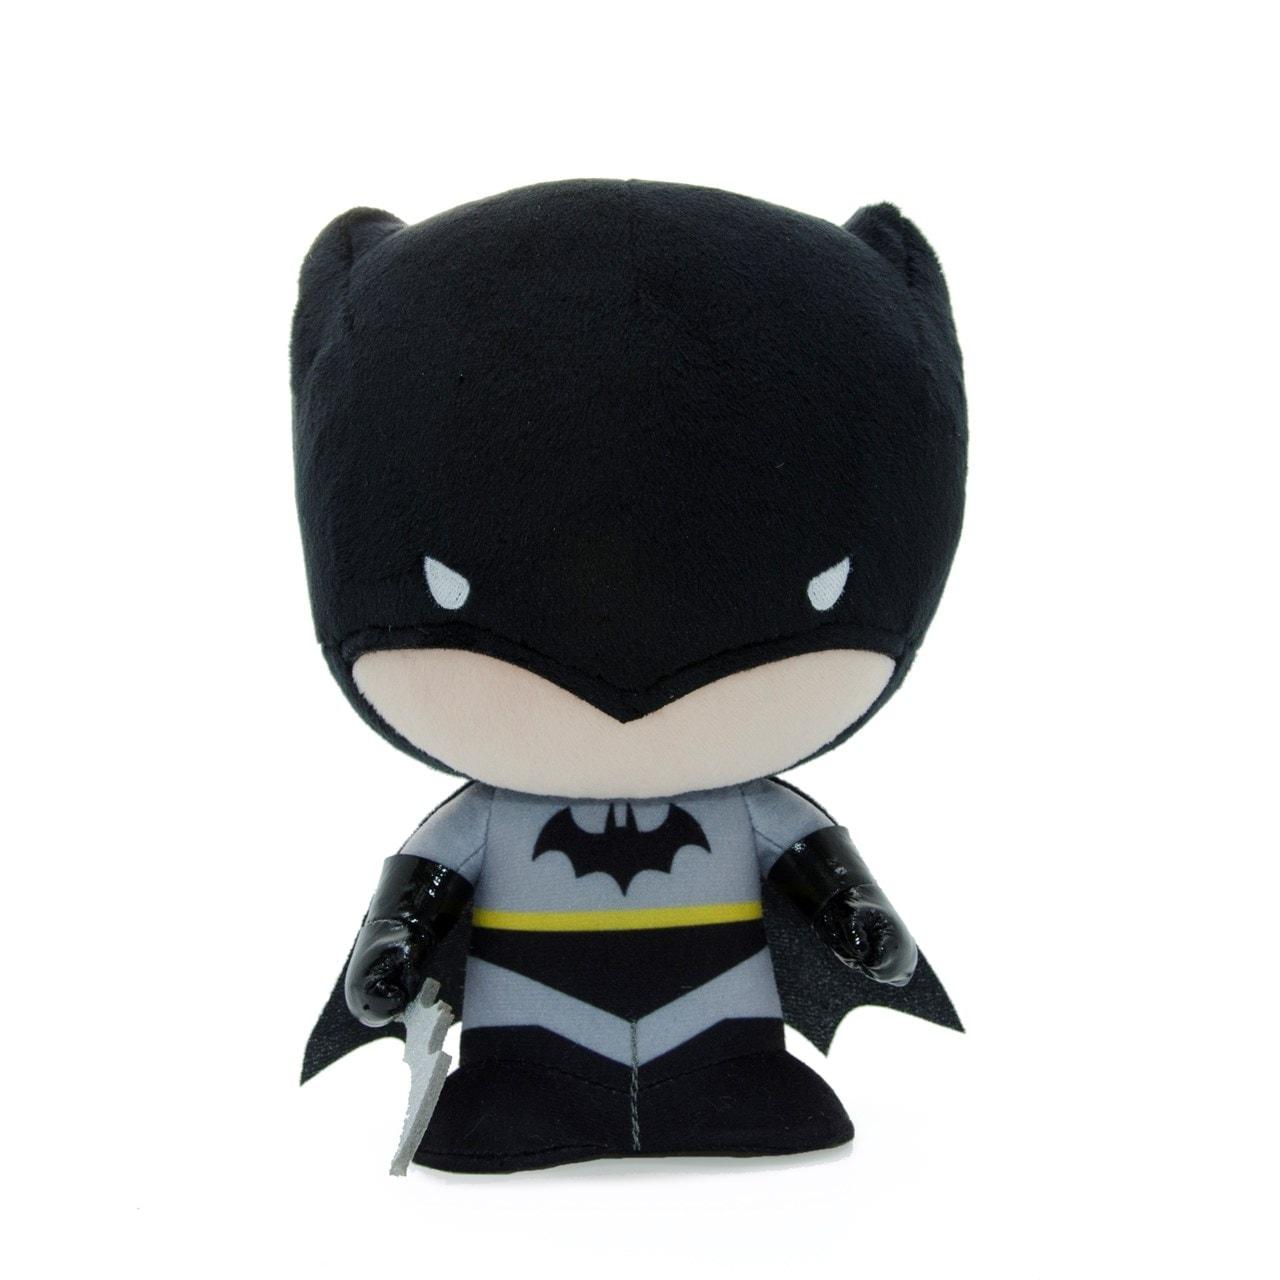 Batman: DZNR Dark Knight Plush Toy - 1